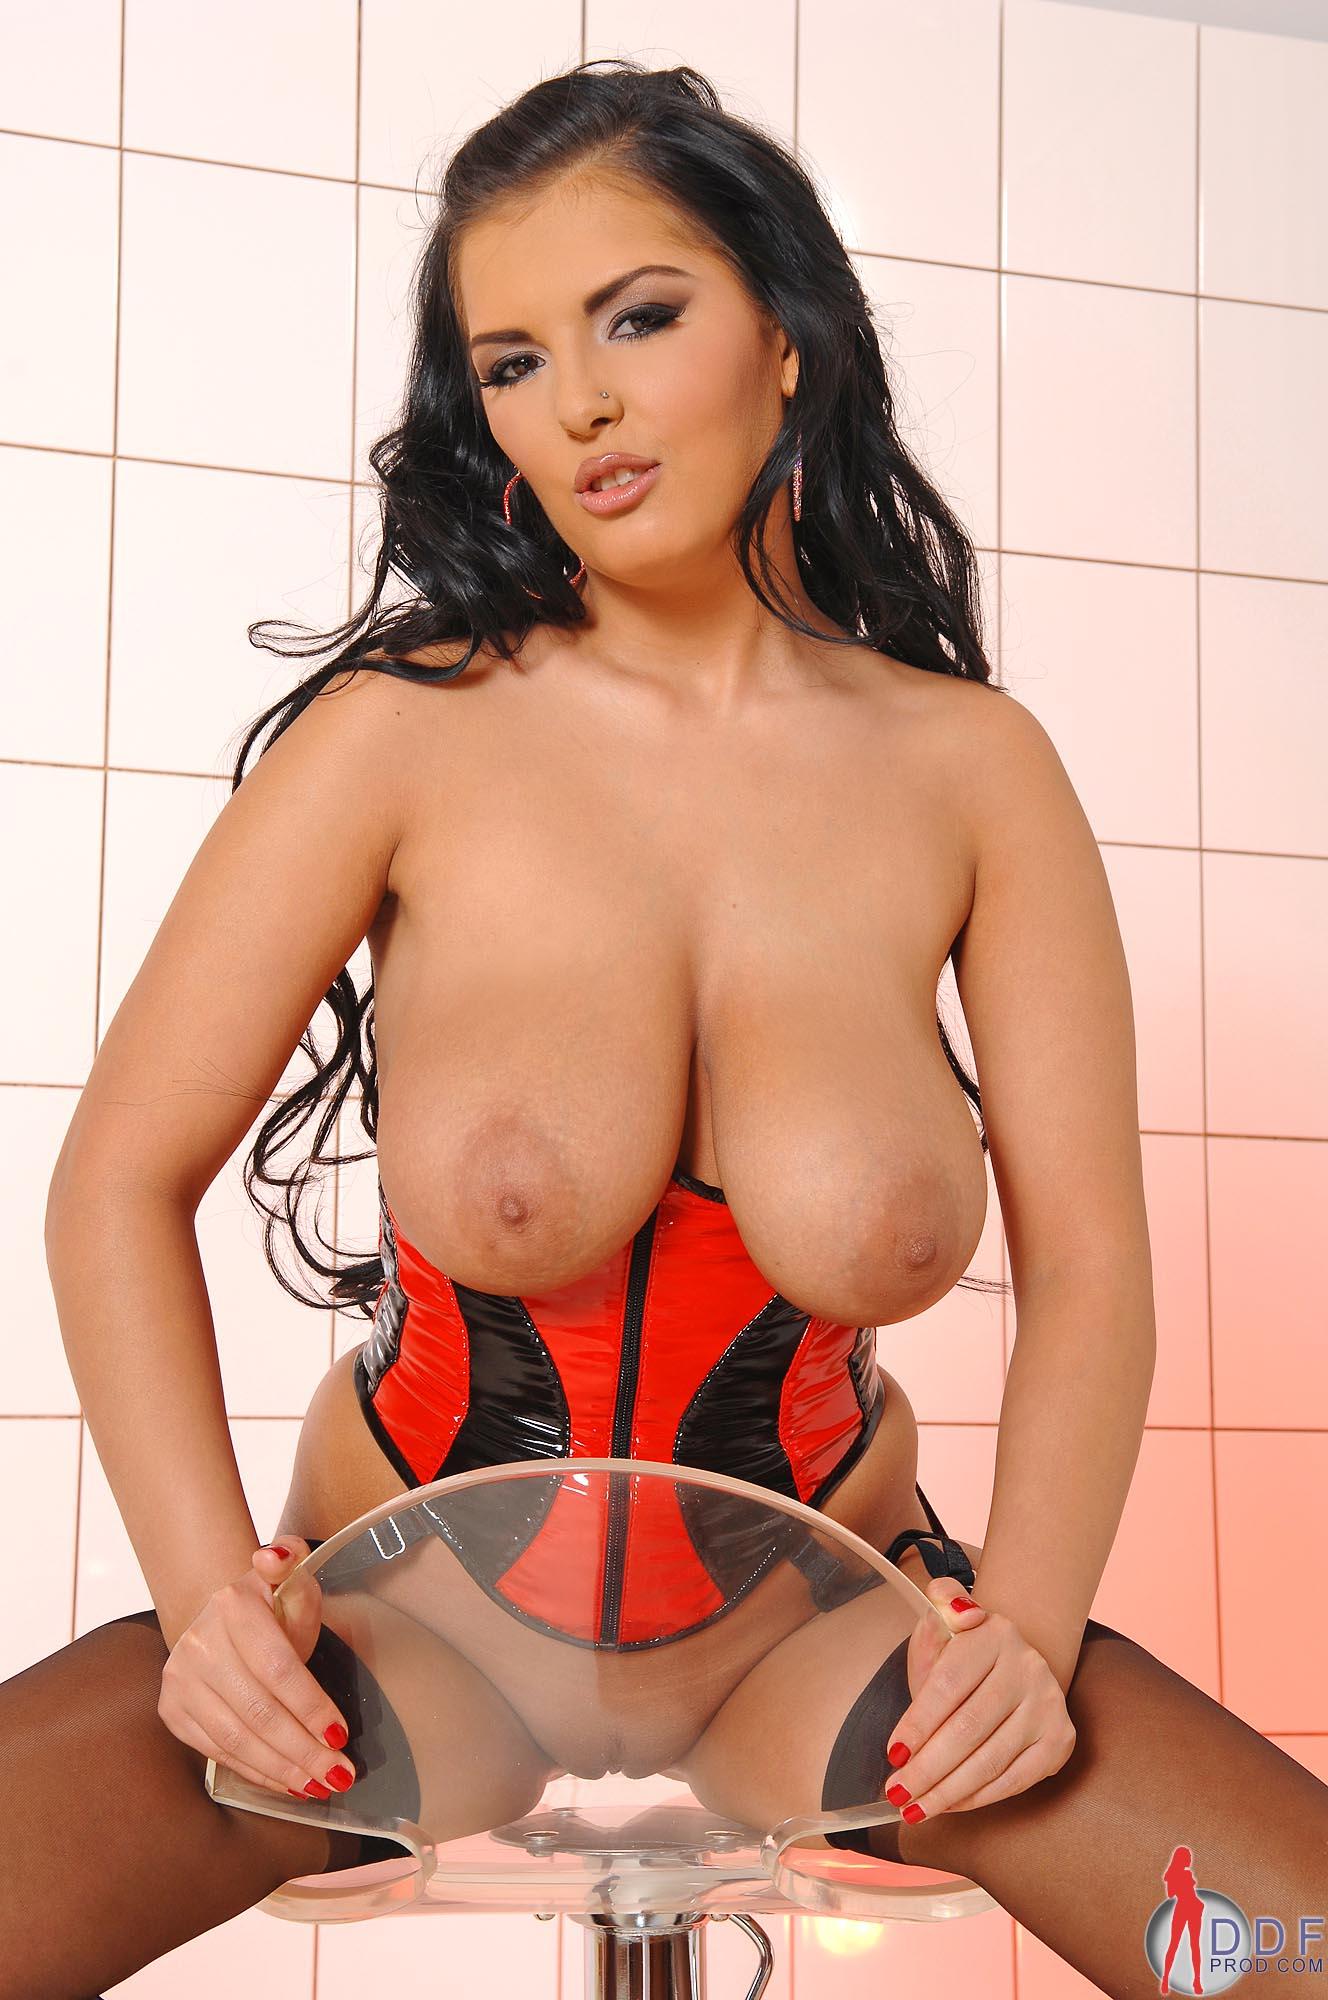 corset pornstar glamor